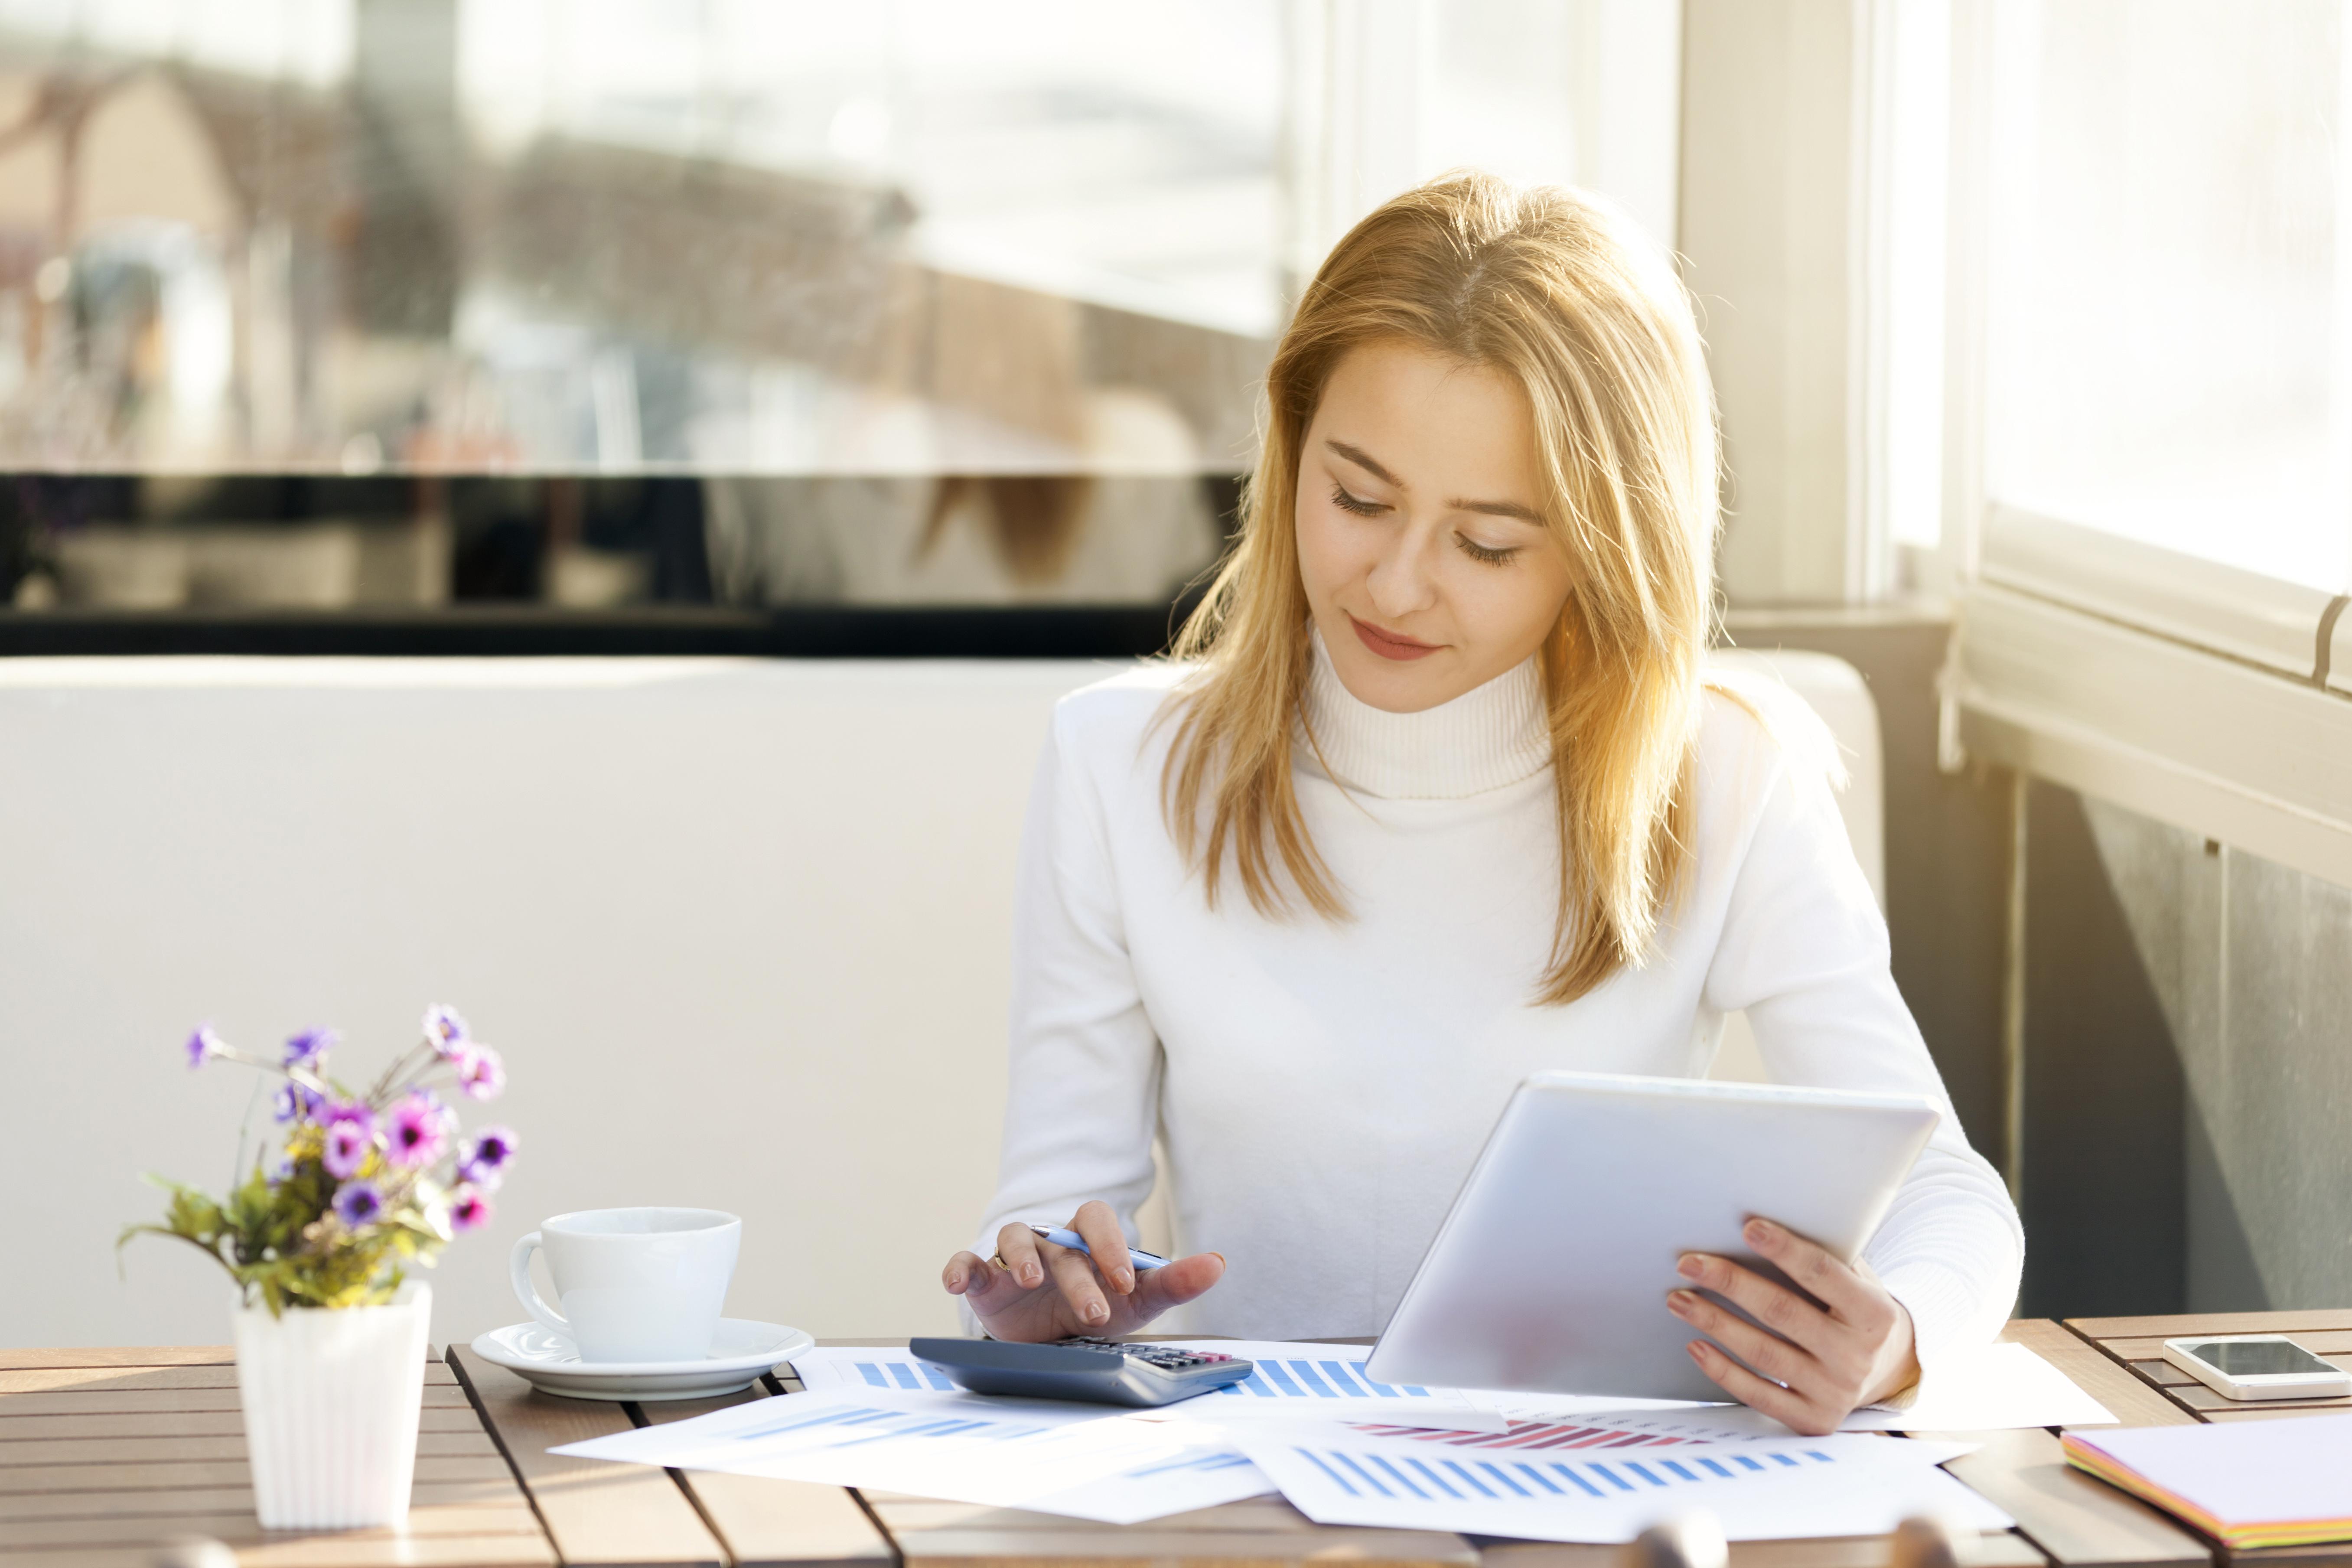 Ženska zamišljeno gleda tablični računalnik